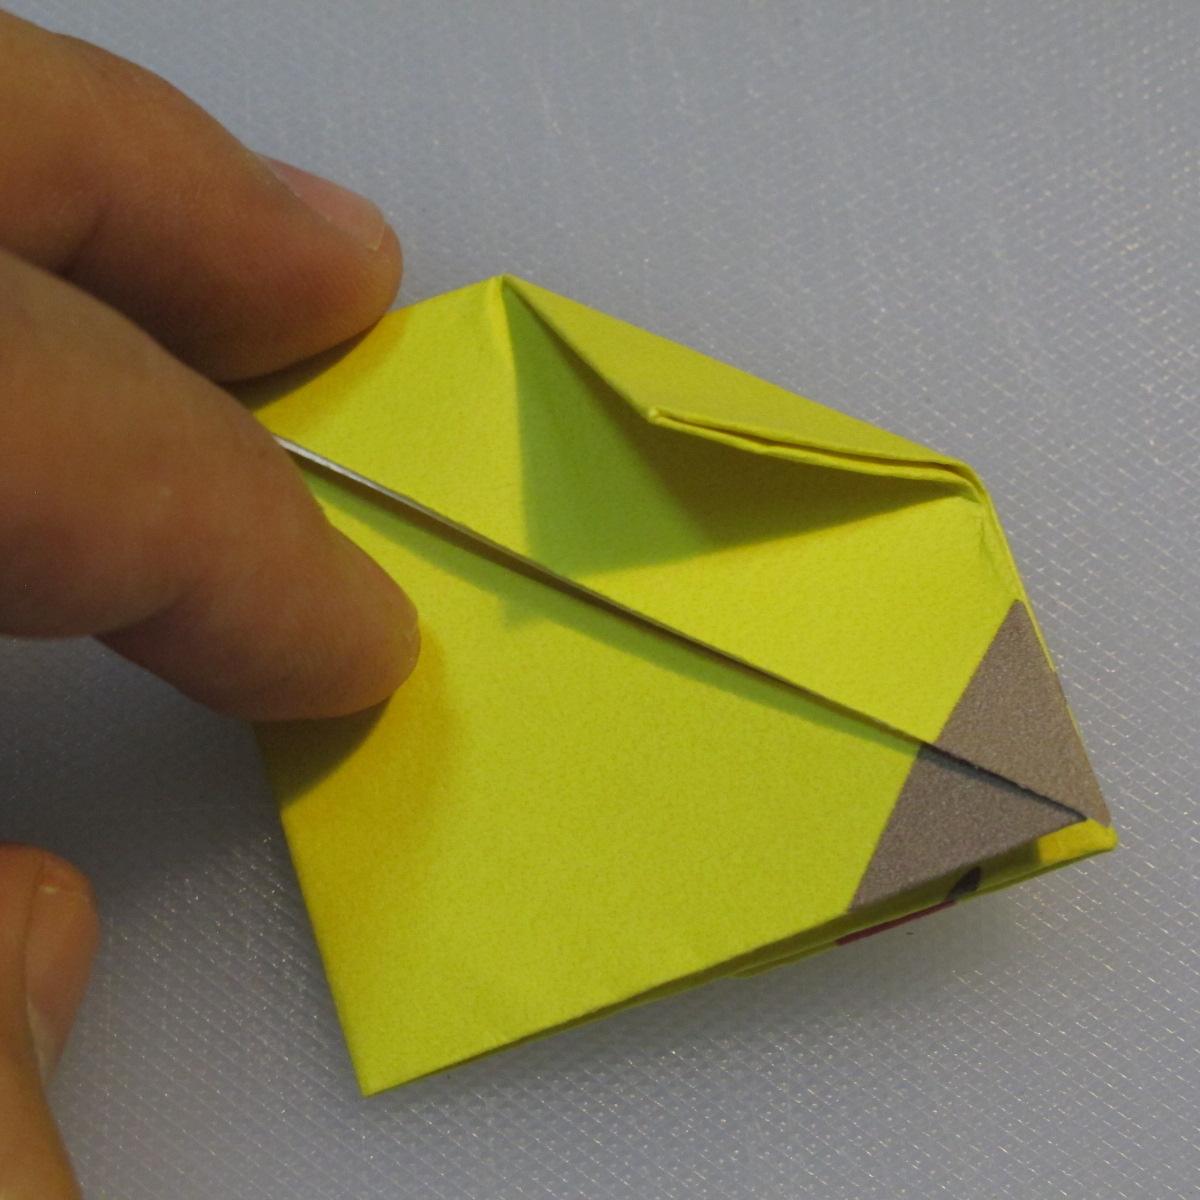 mookeep-วิธีพับกระดาษเป็นรูปปิกาจู-01-015